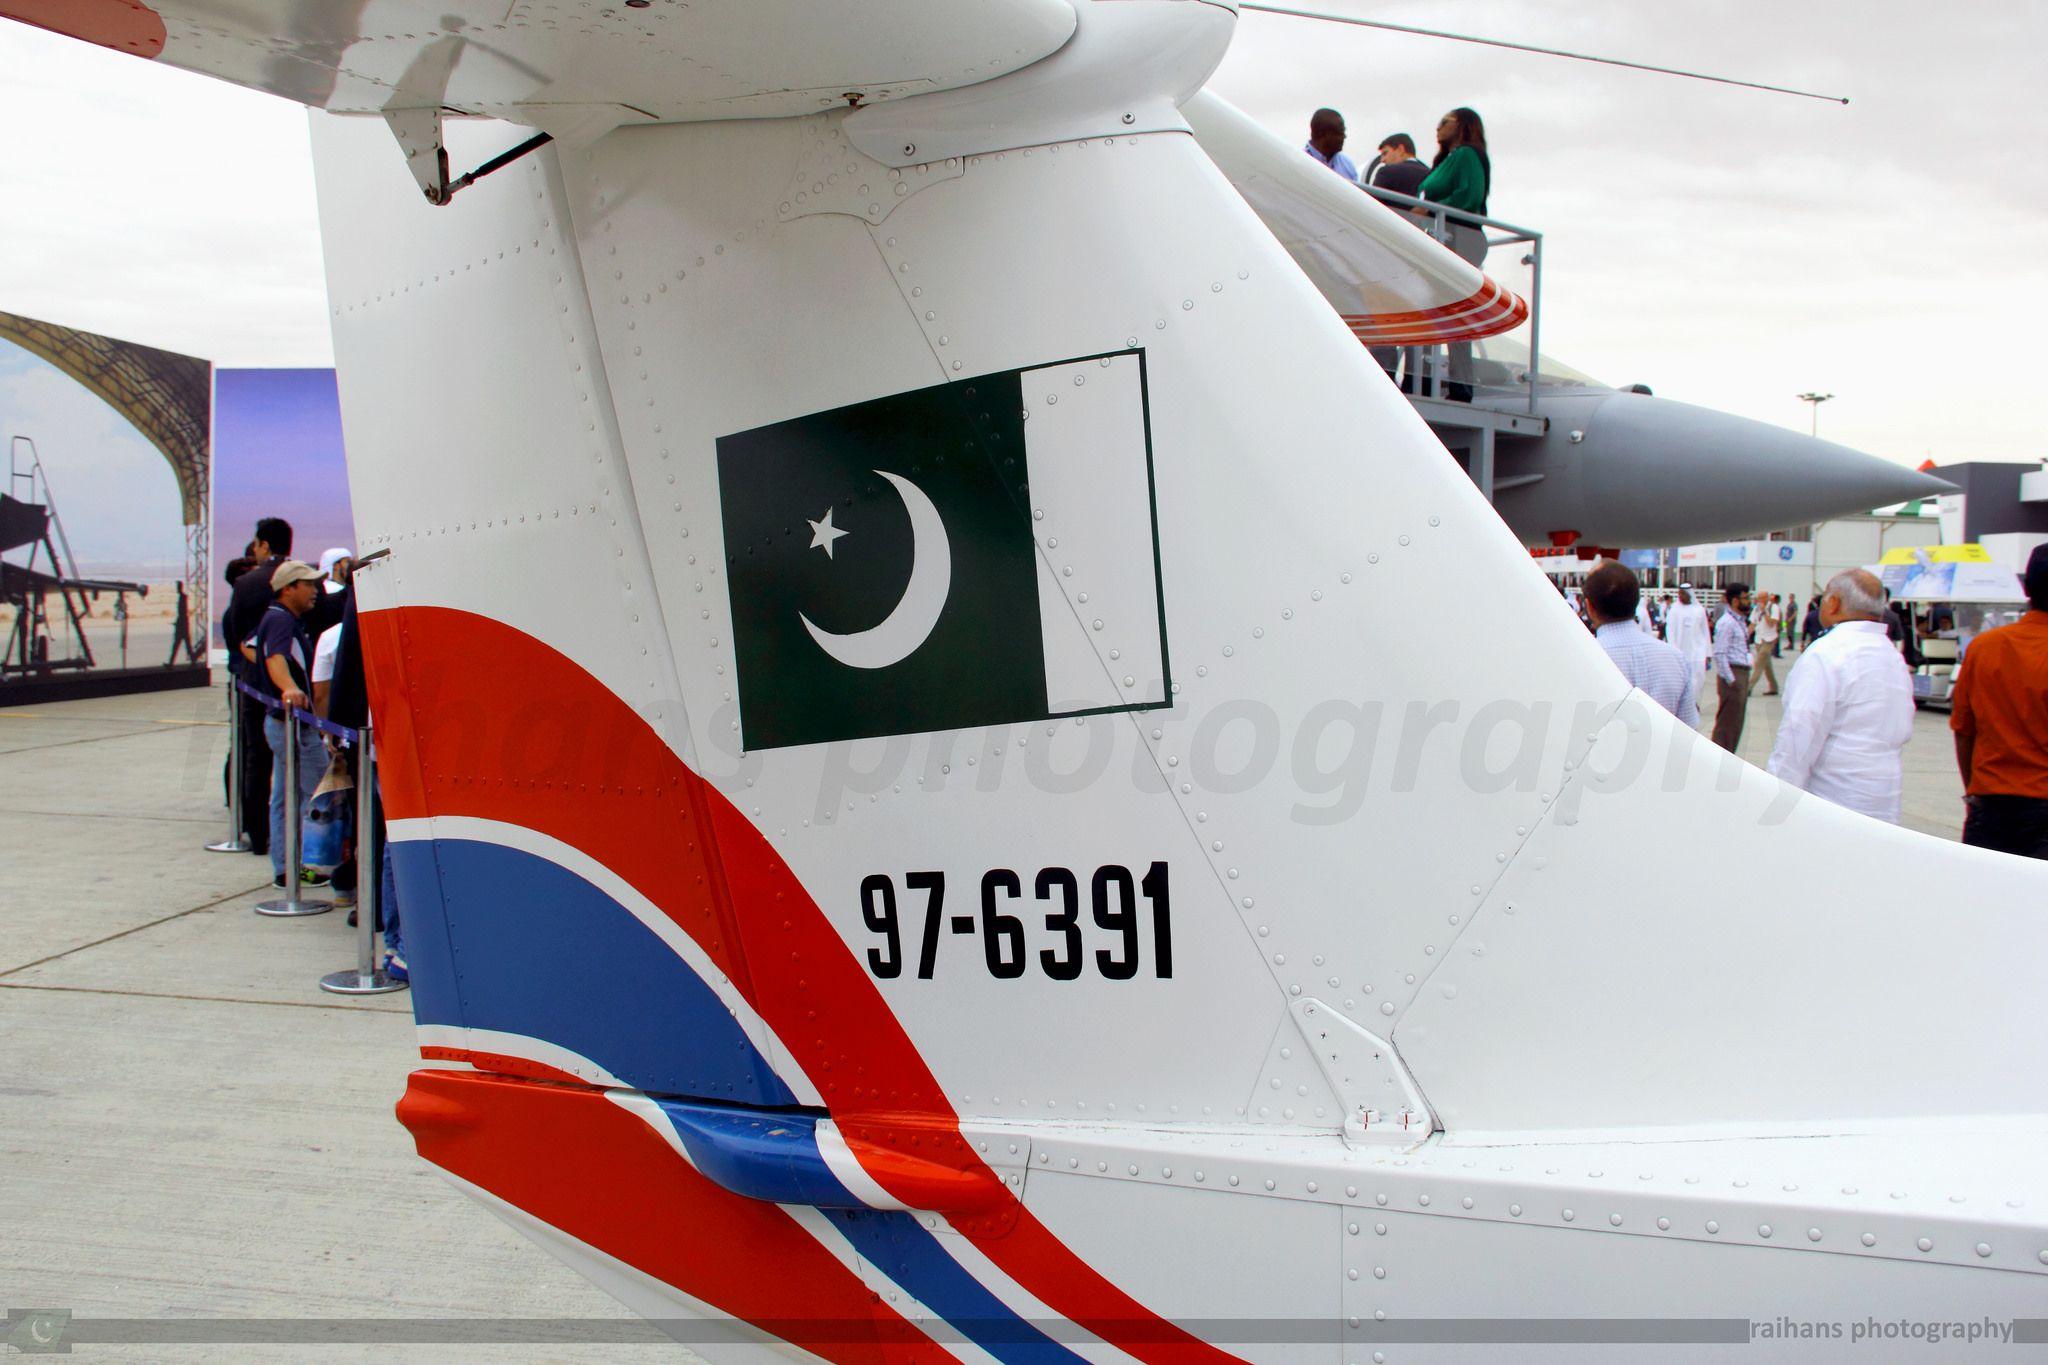 Pakistan Air Force Super Mushshak SMK 1711 976391